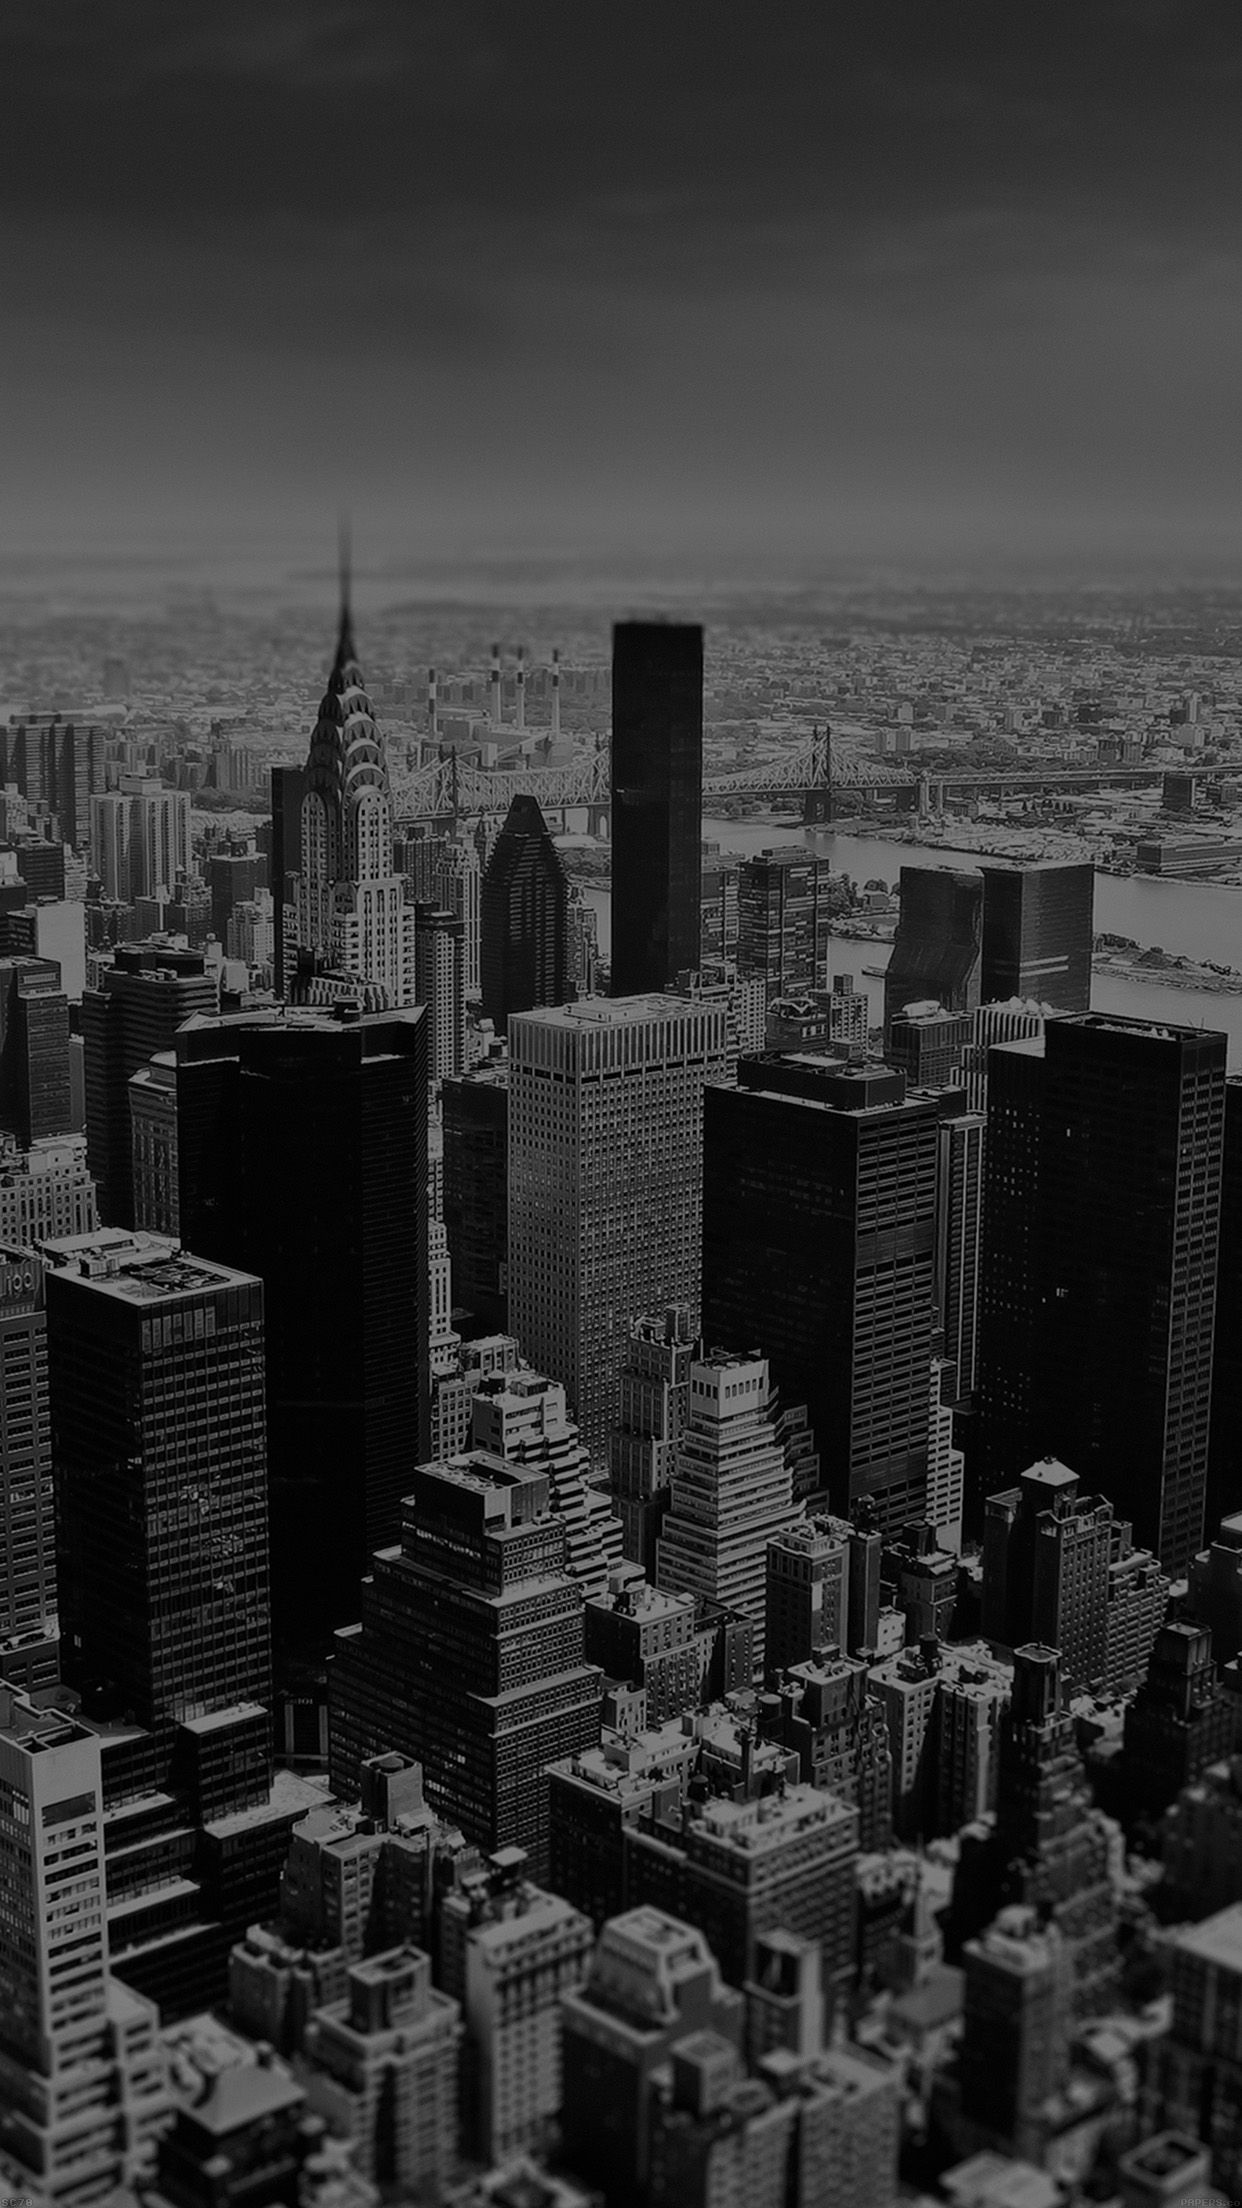 Papersco Mi03 New York Sky Tilt Shift City 34 Iphone6 Plus Wallpaper 1242x2208 Pixels